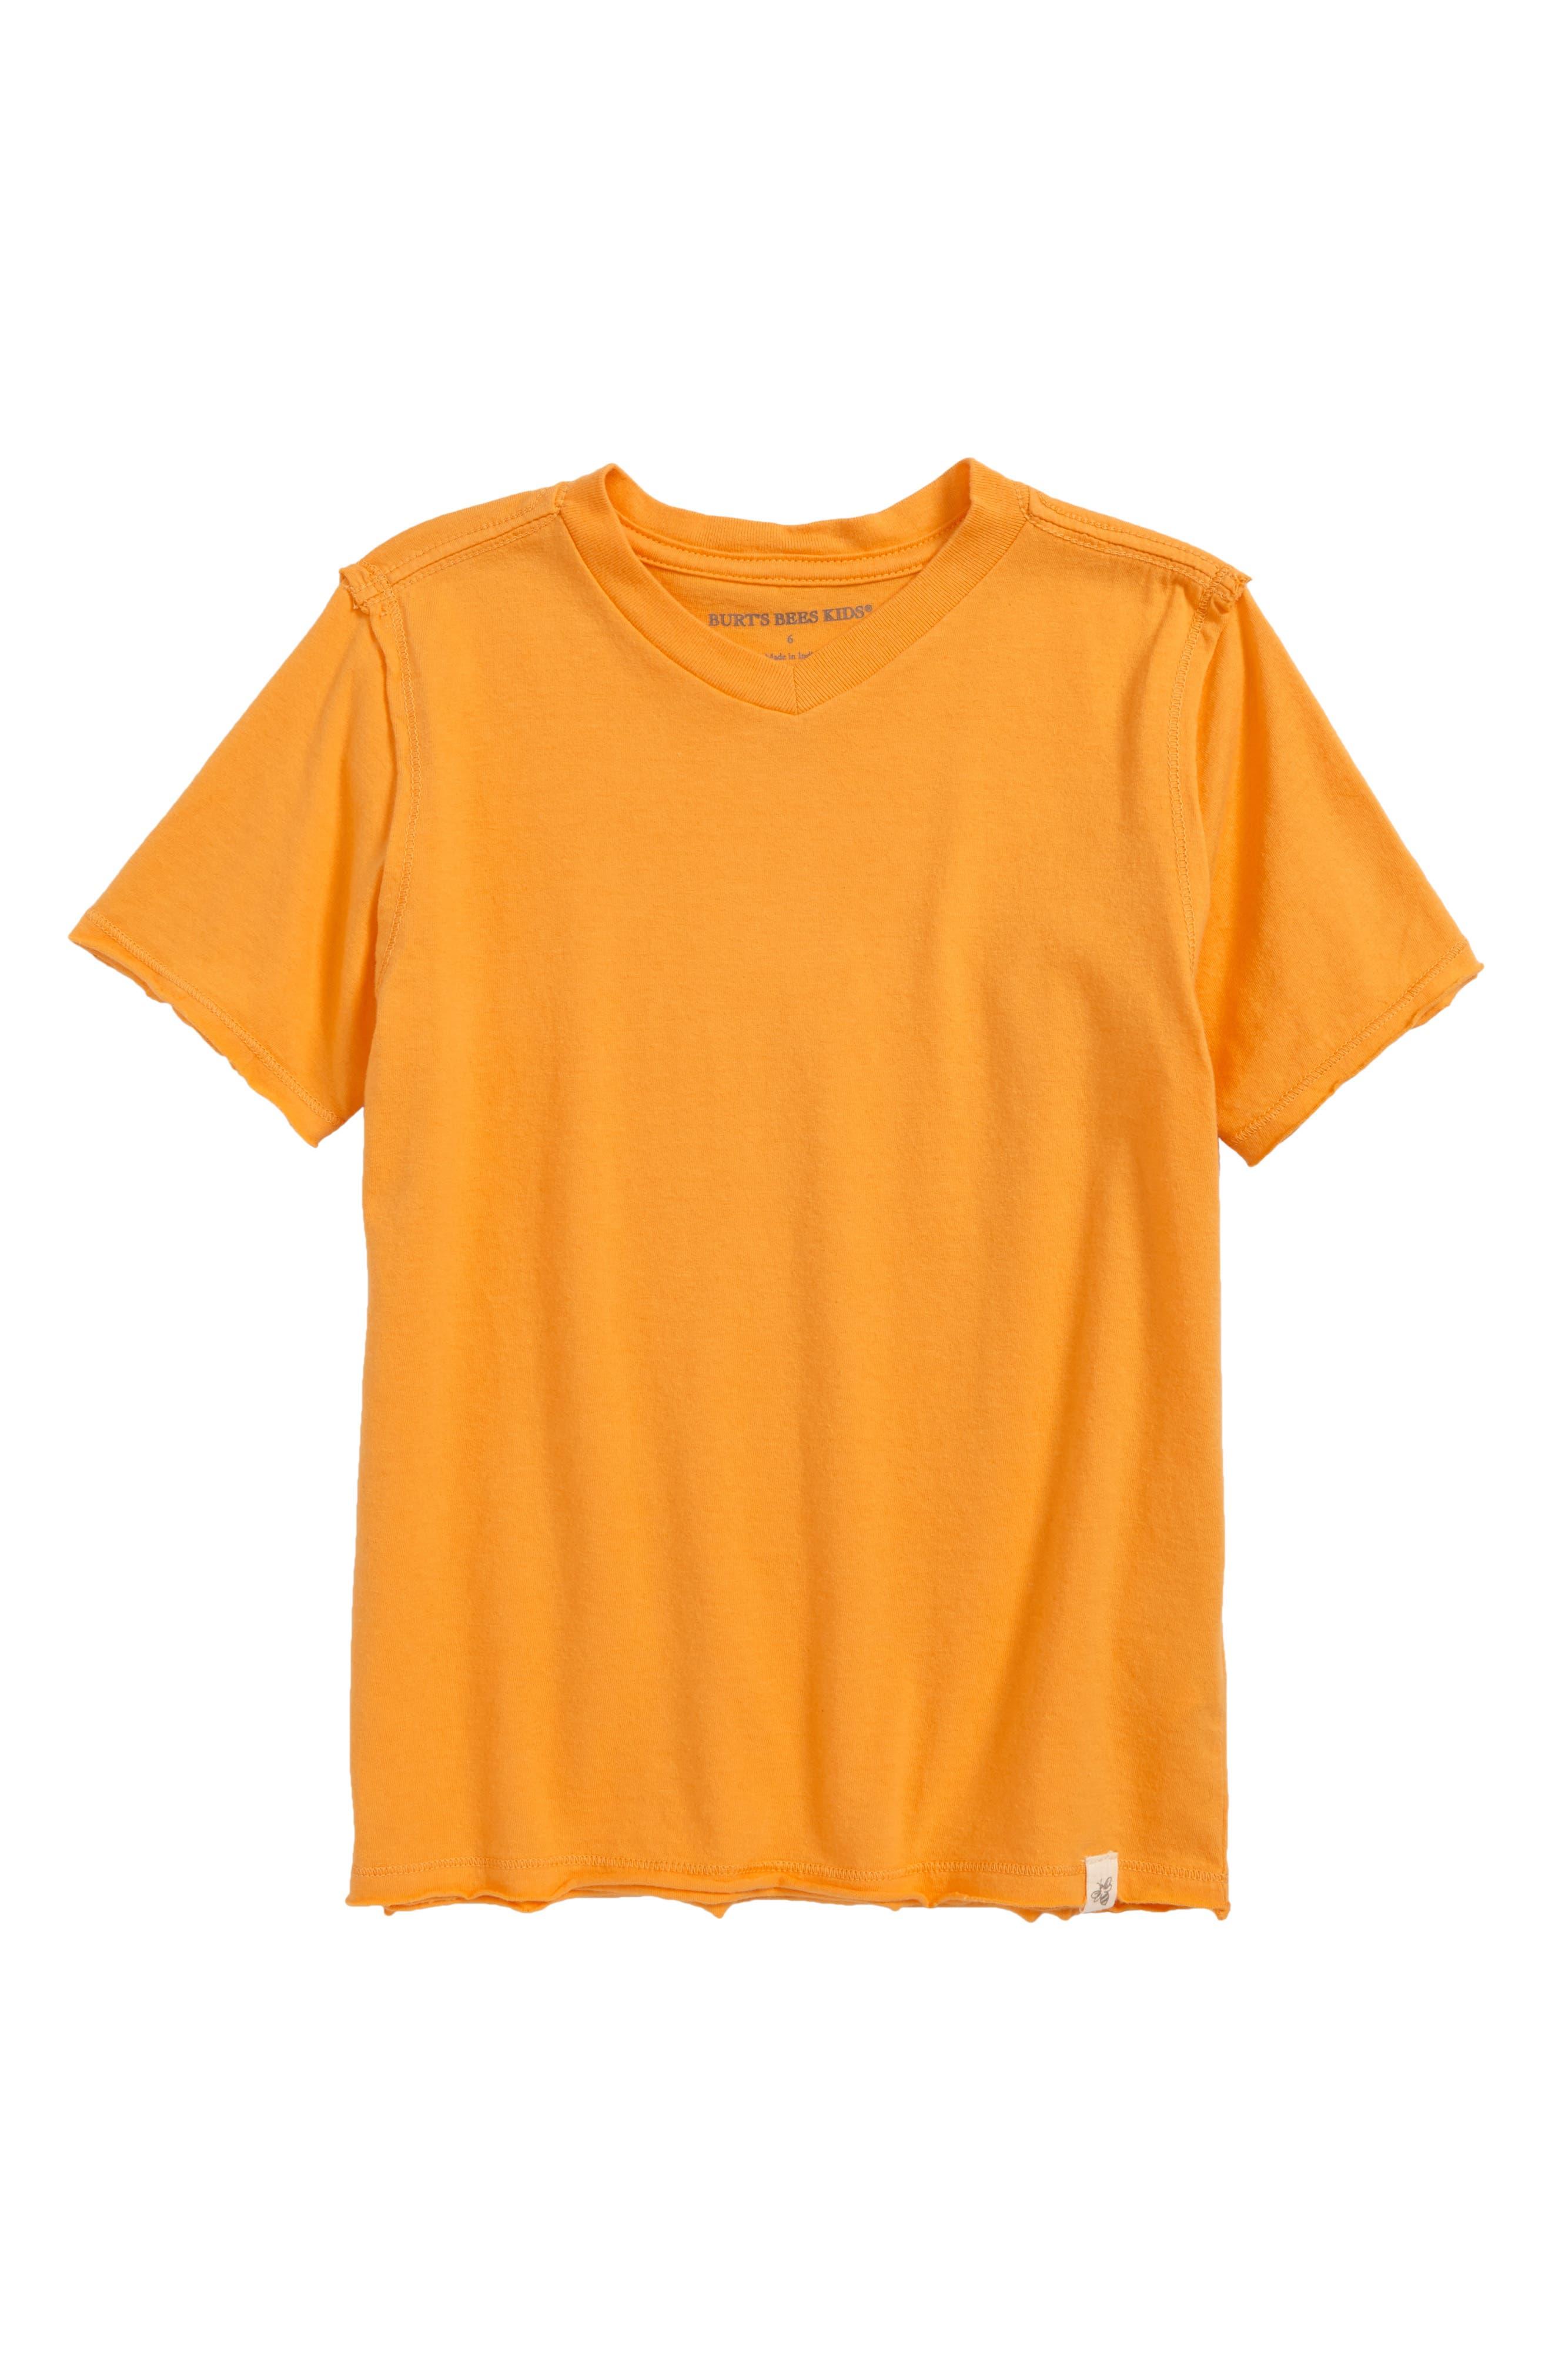 Alternate Image 1 Selected - Burt's Bees Baby V-Neck Organic Cotton T-Shirt (Toddler Boys & Little Boys)